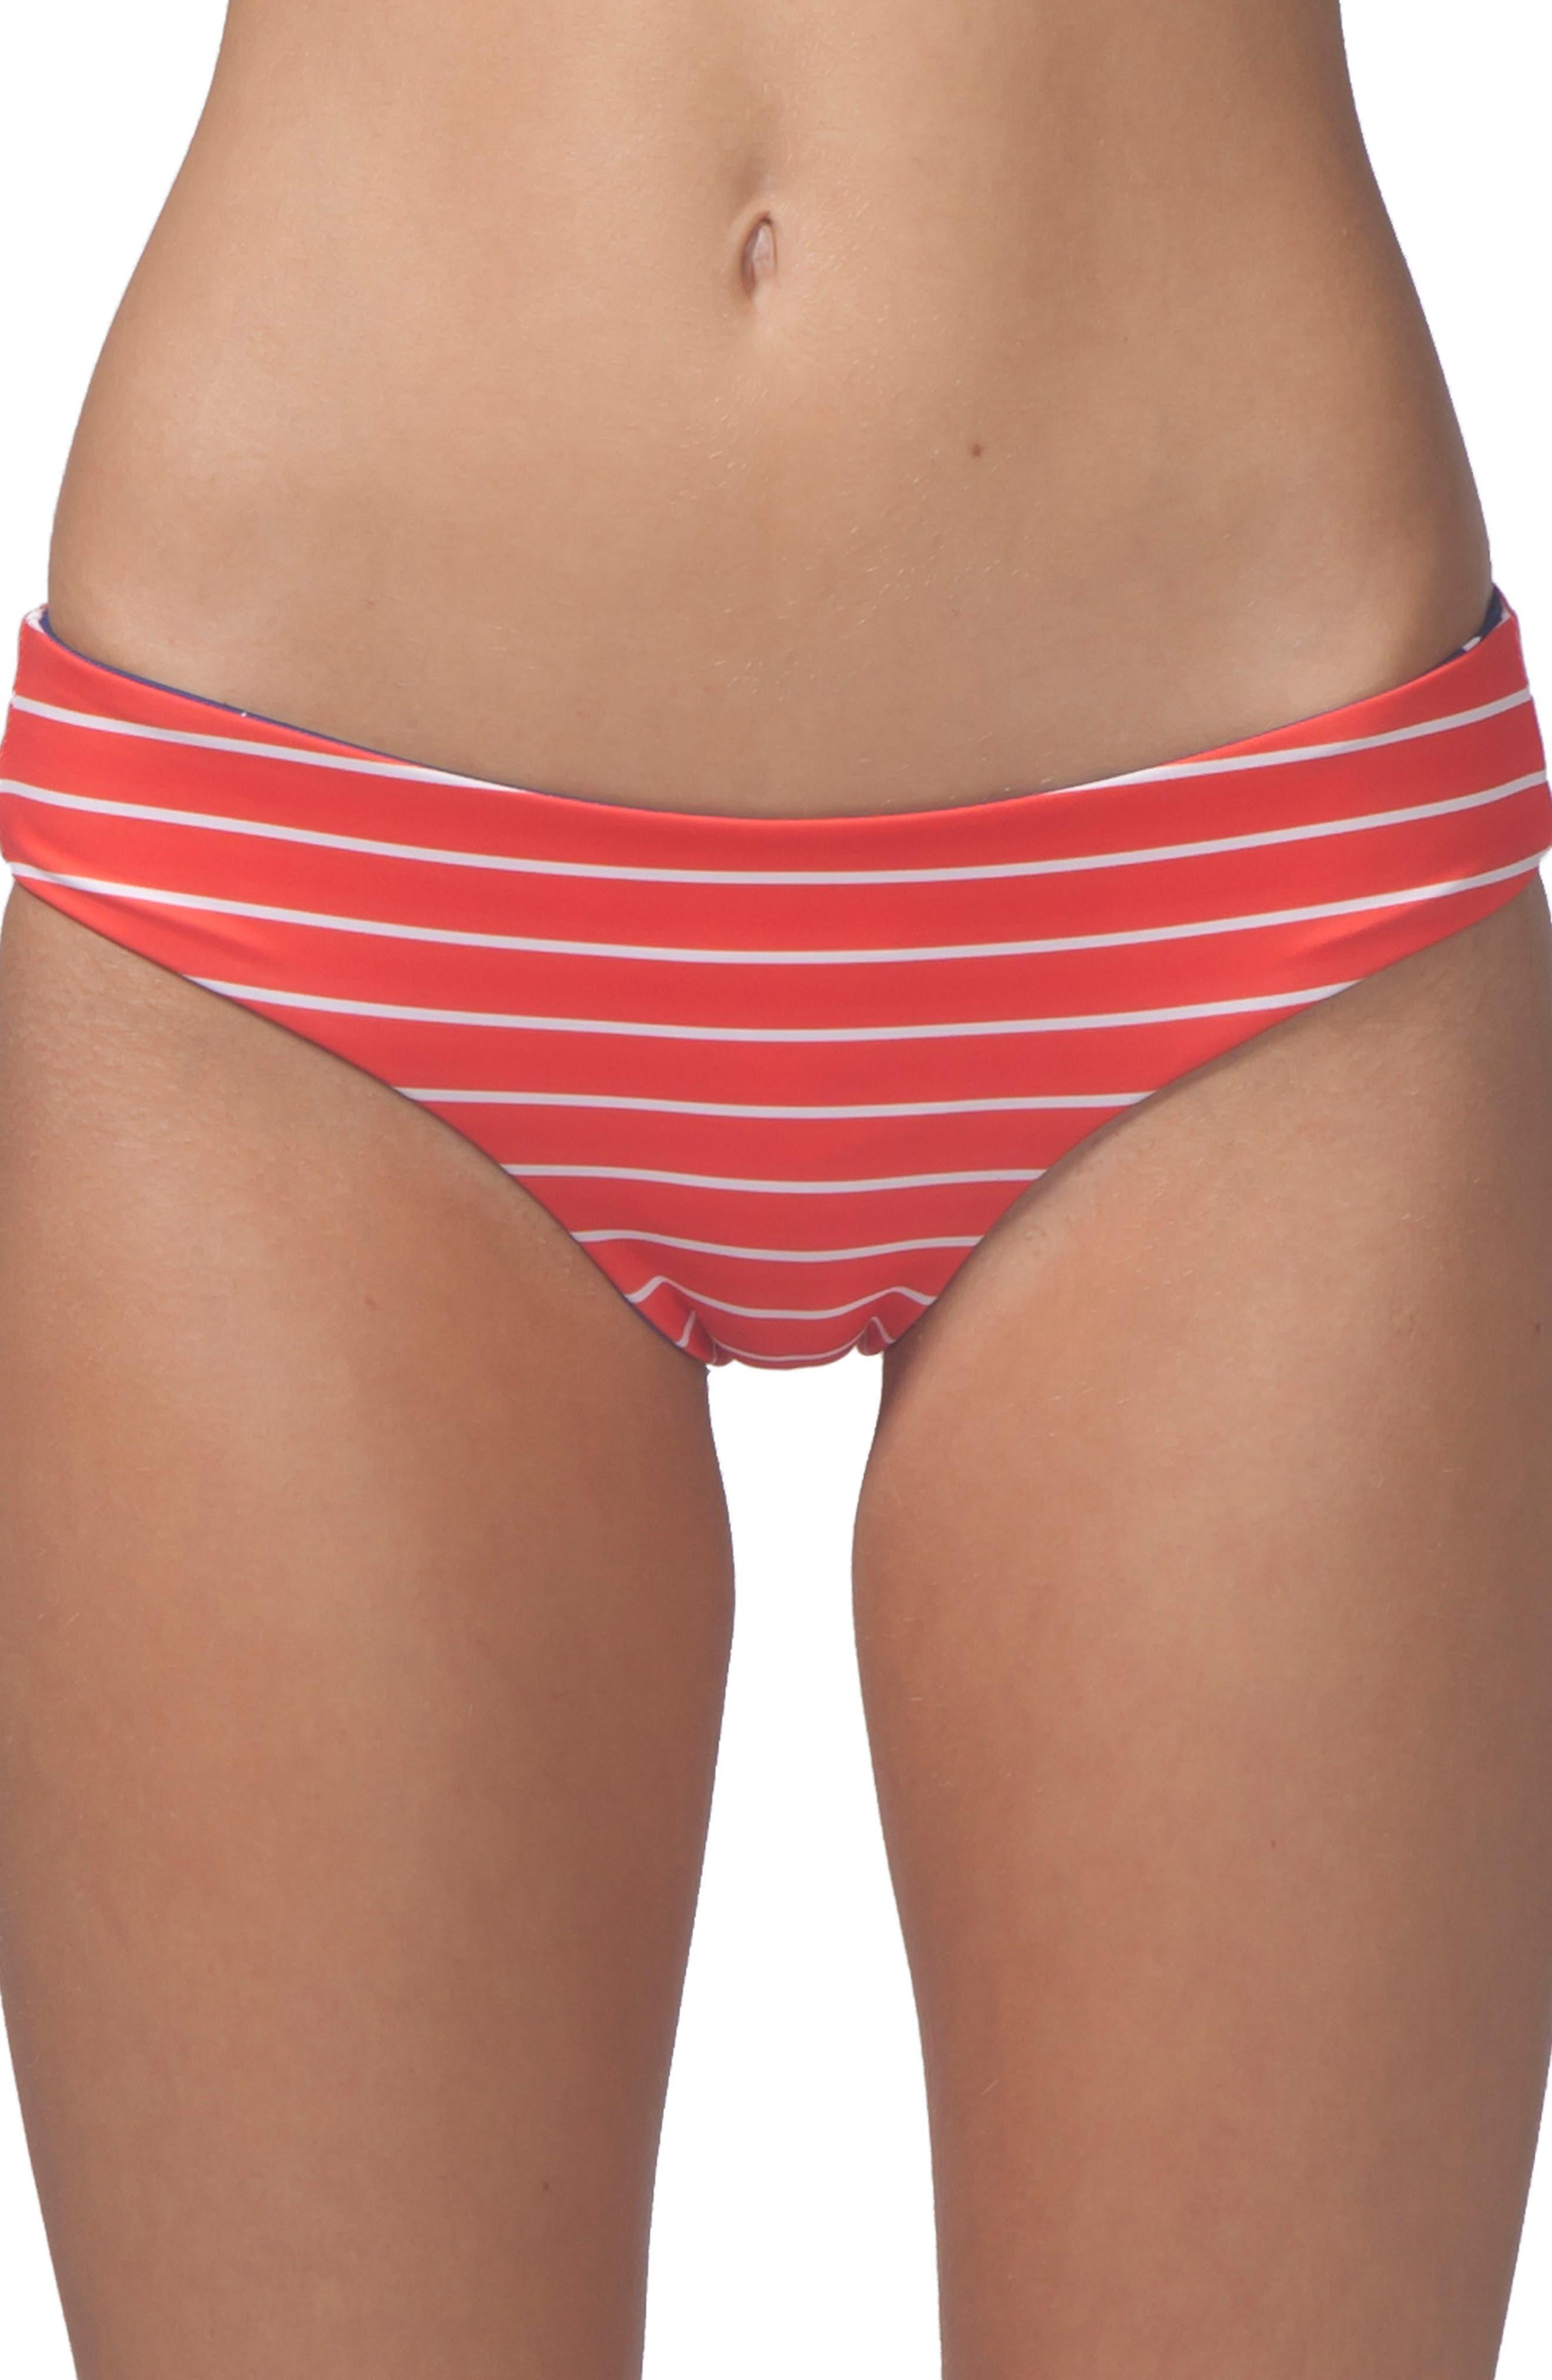 Alternate Image 4  - Rip Curl Rising Star Reversible Hipster Bikini Bottoms